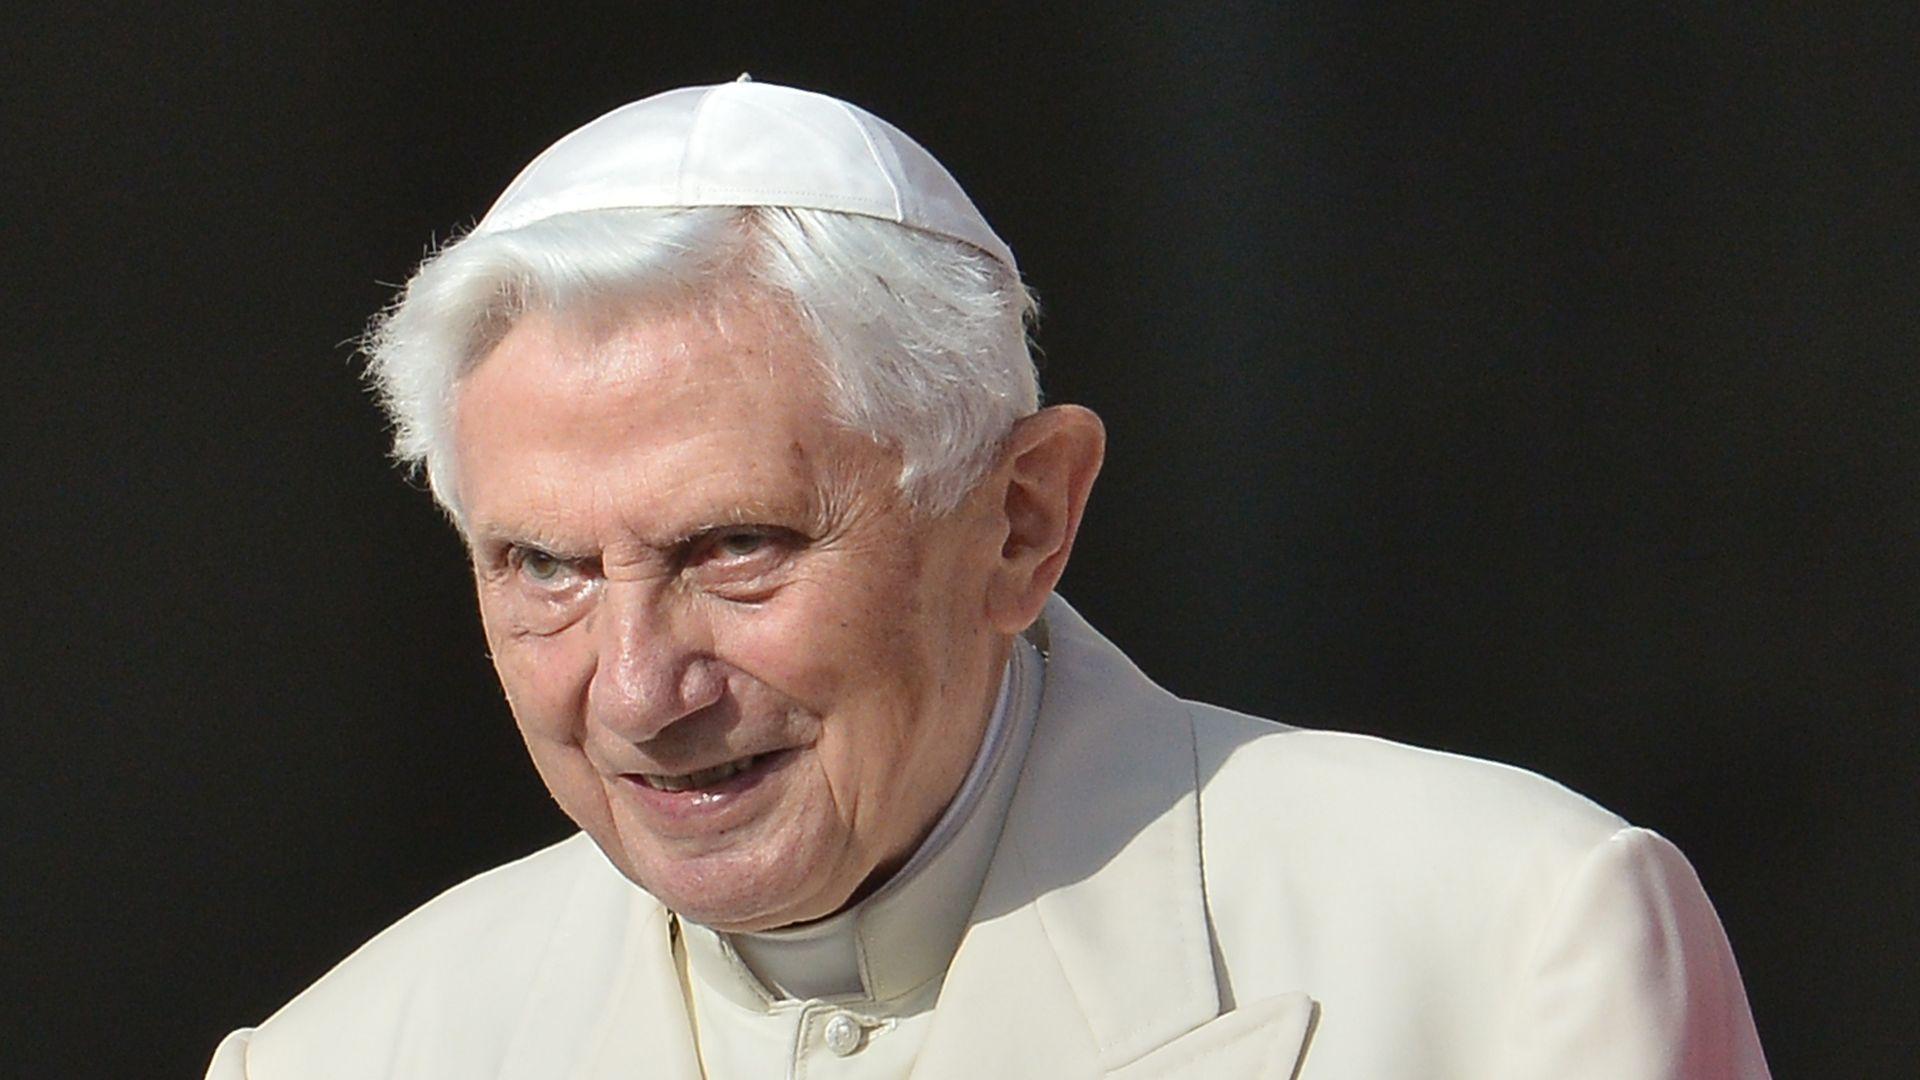 Retired Pope Benedict XVI